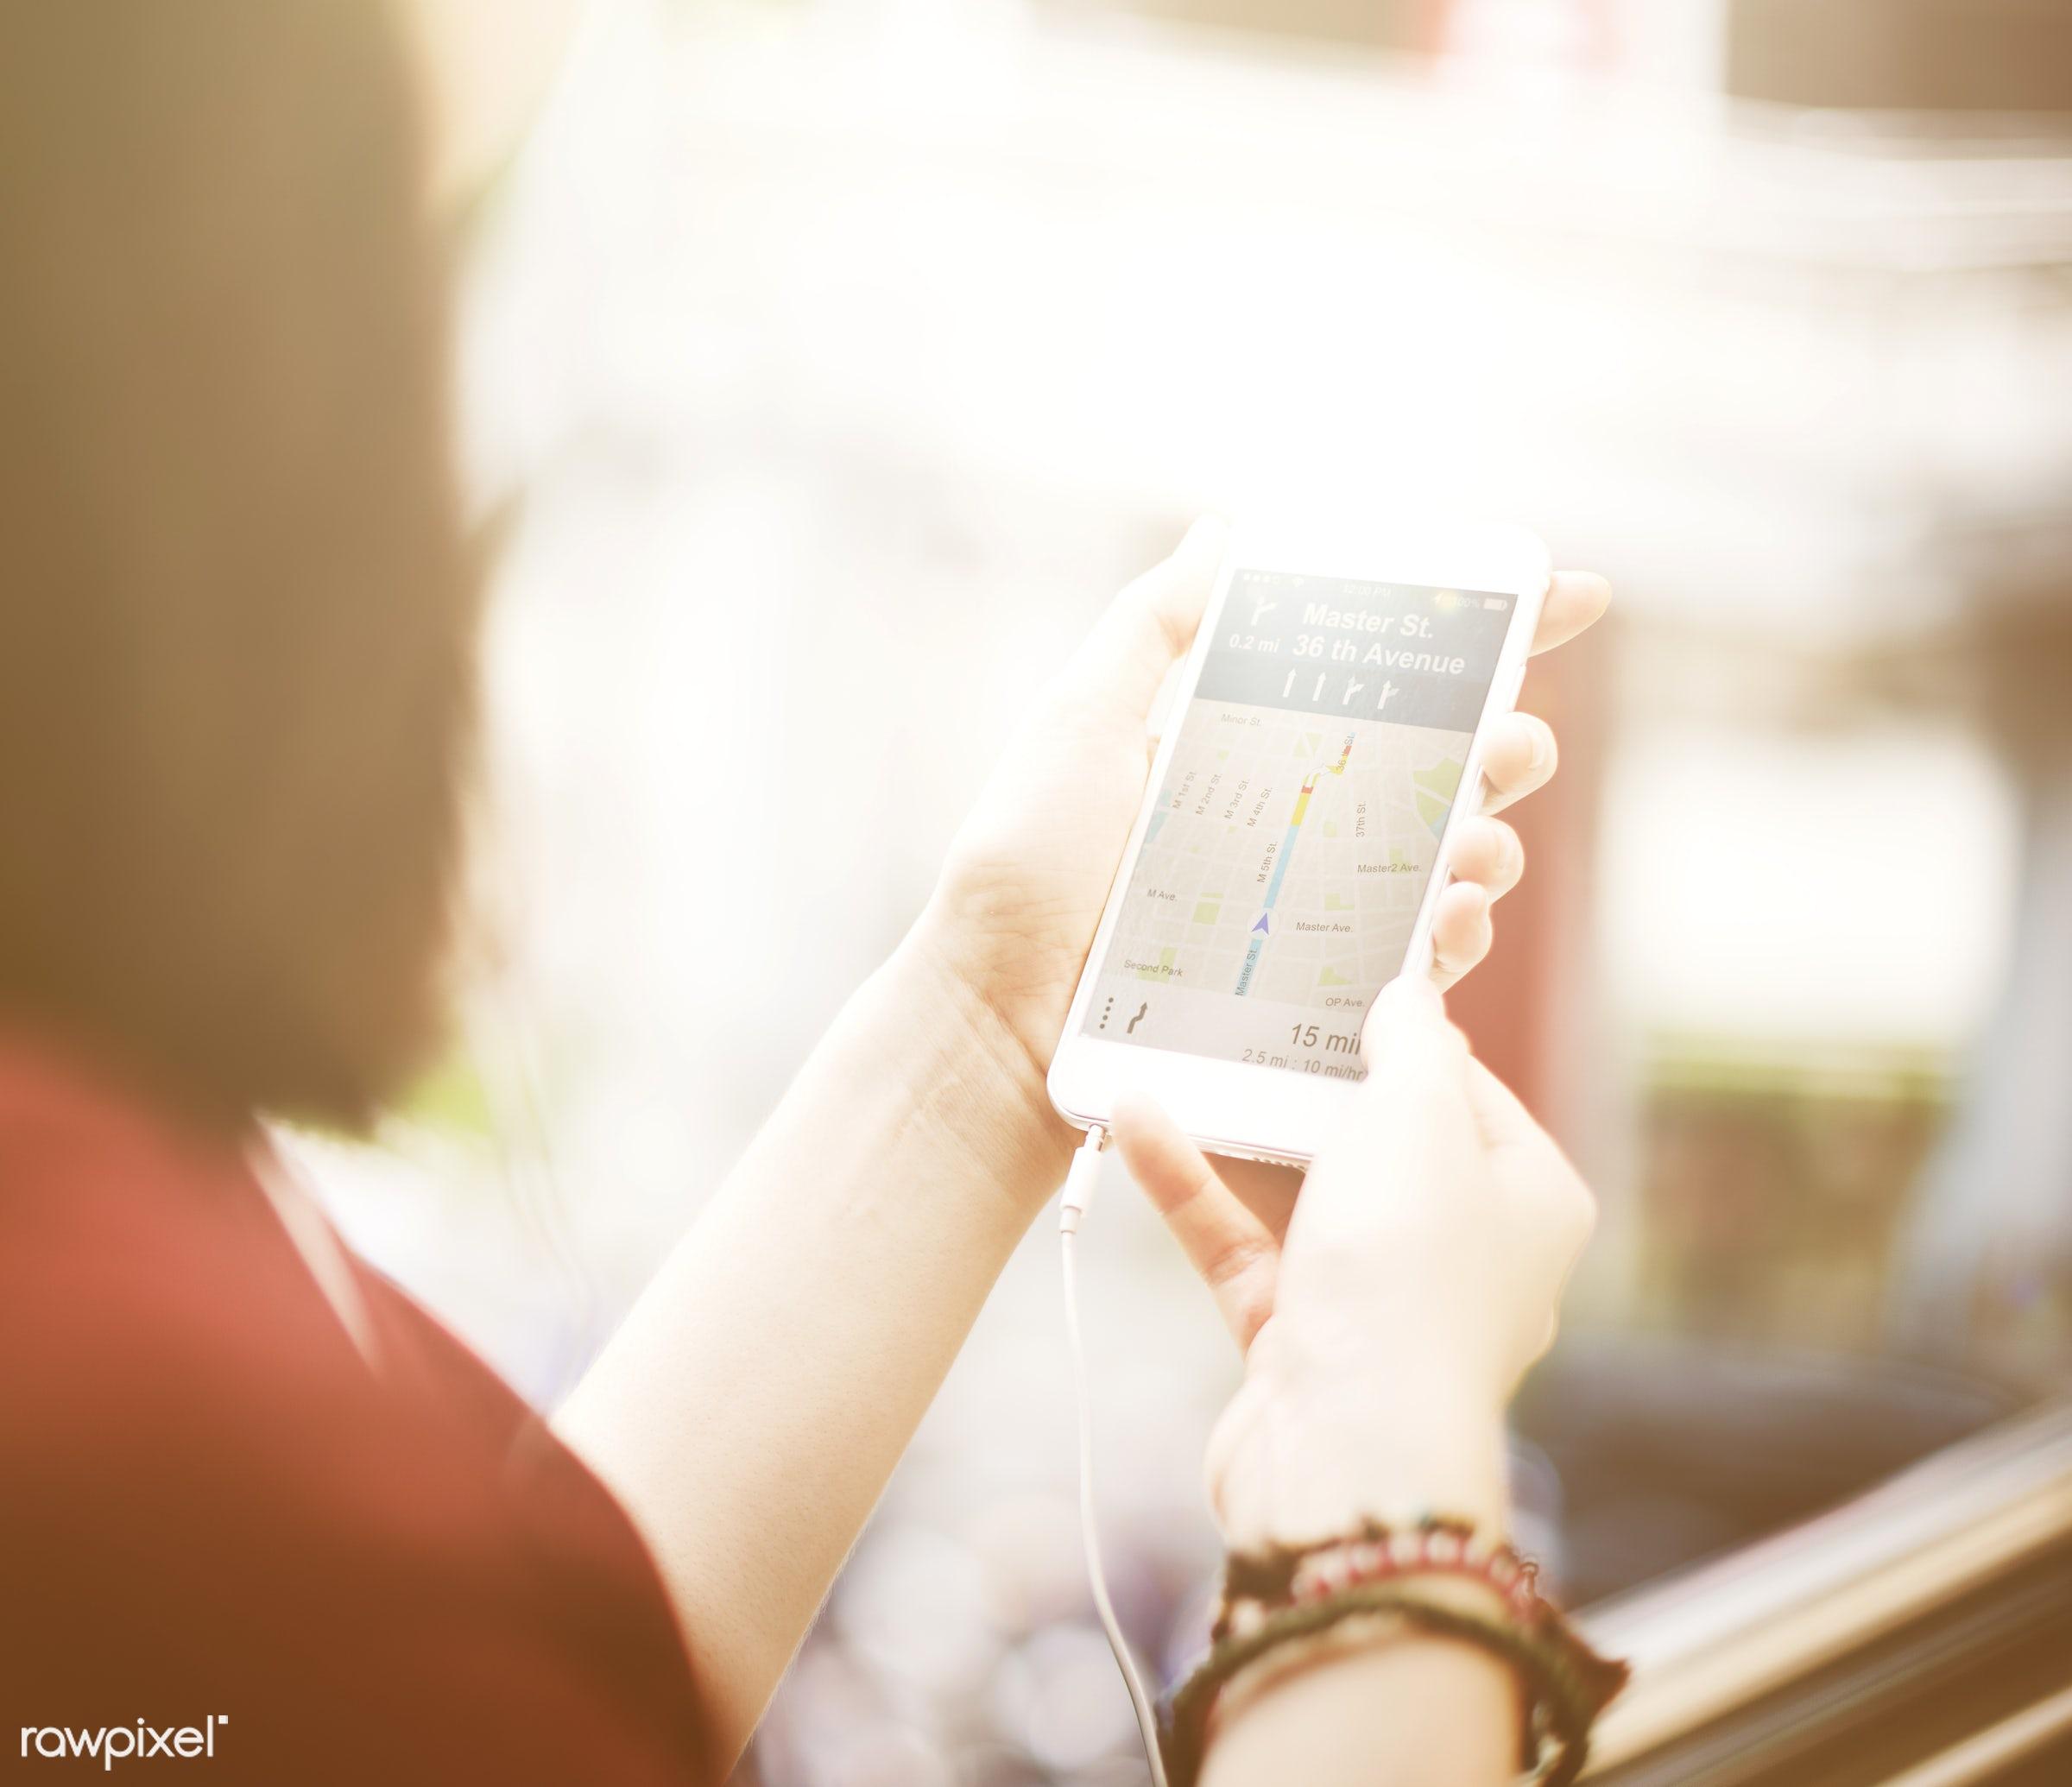 app, assist, browsing, commuter, destination, device, digital, digital device, direction, display, electronic, find, gadget...